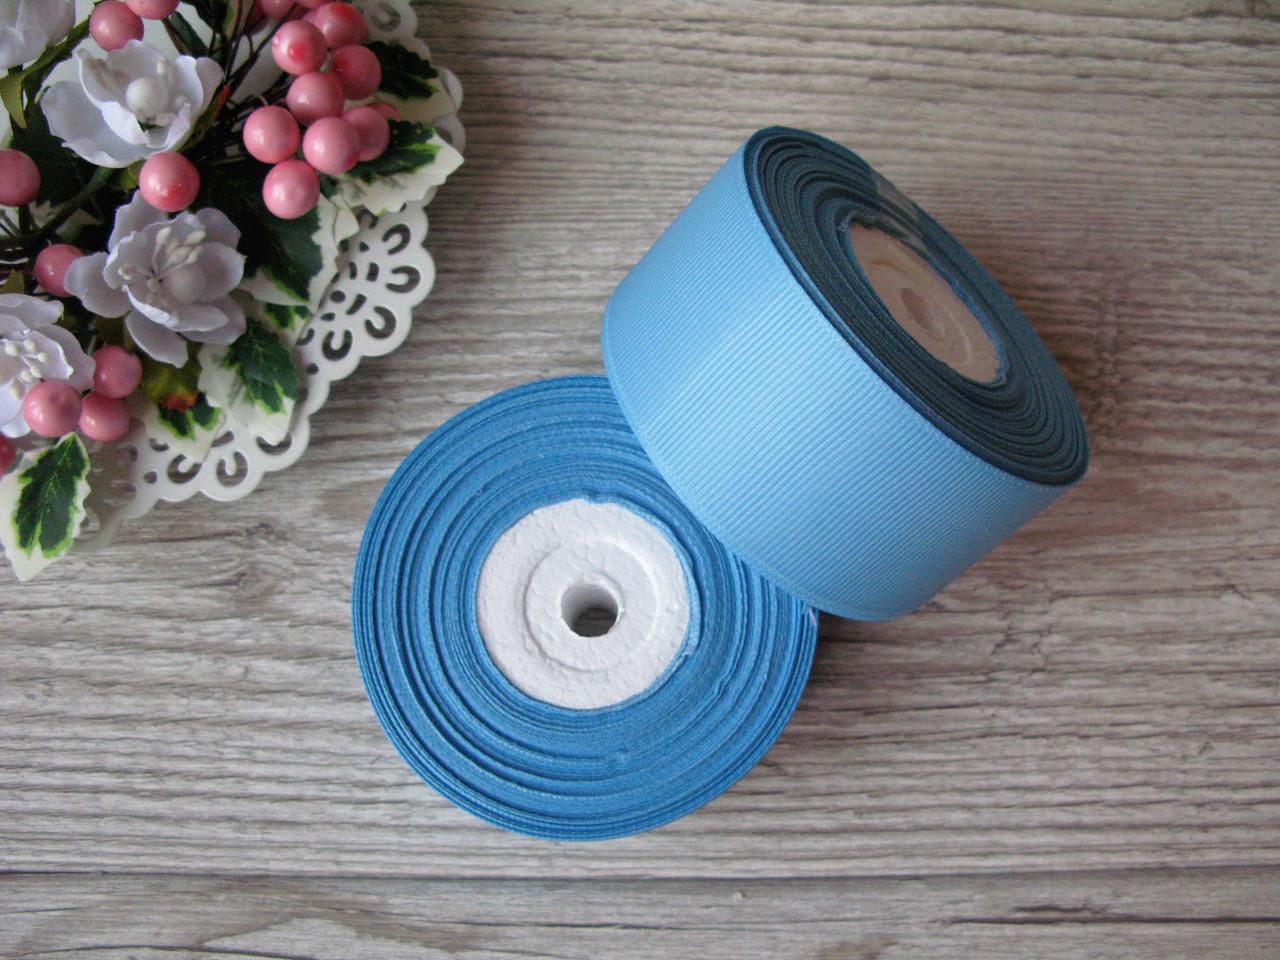 Лента репсовая 4 см темно голубой, бобина 18 м - 51 грн